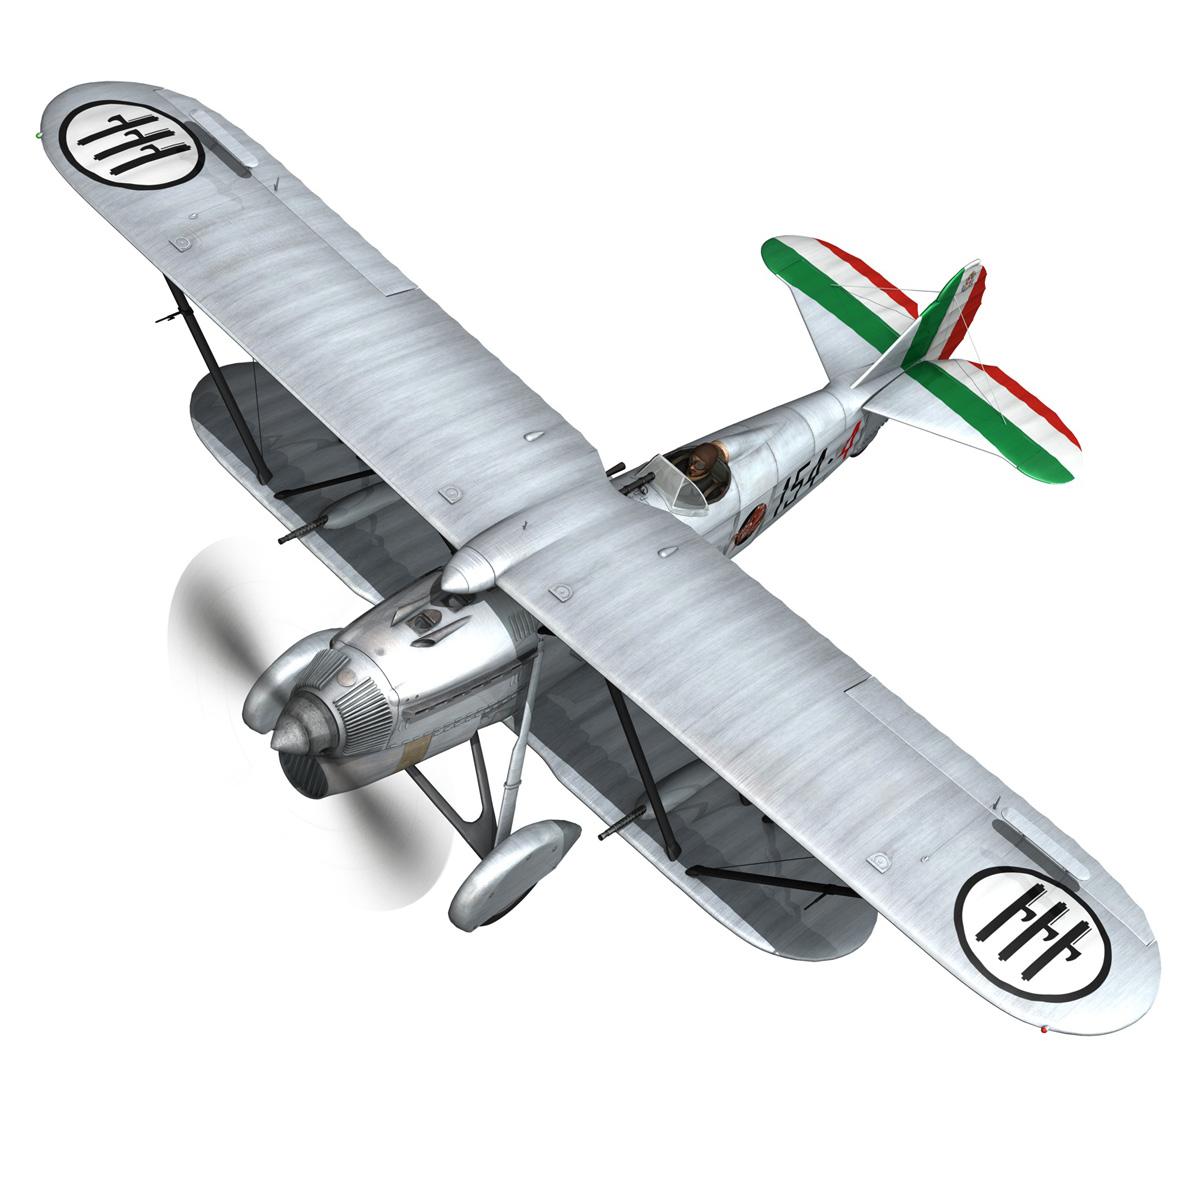 fiat cr.32 – italy airforce – 154 squadriglia 3d model fbx c4d lwo obj 268135